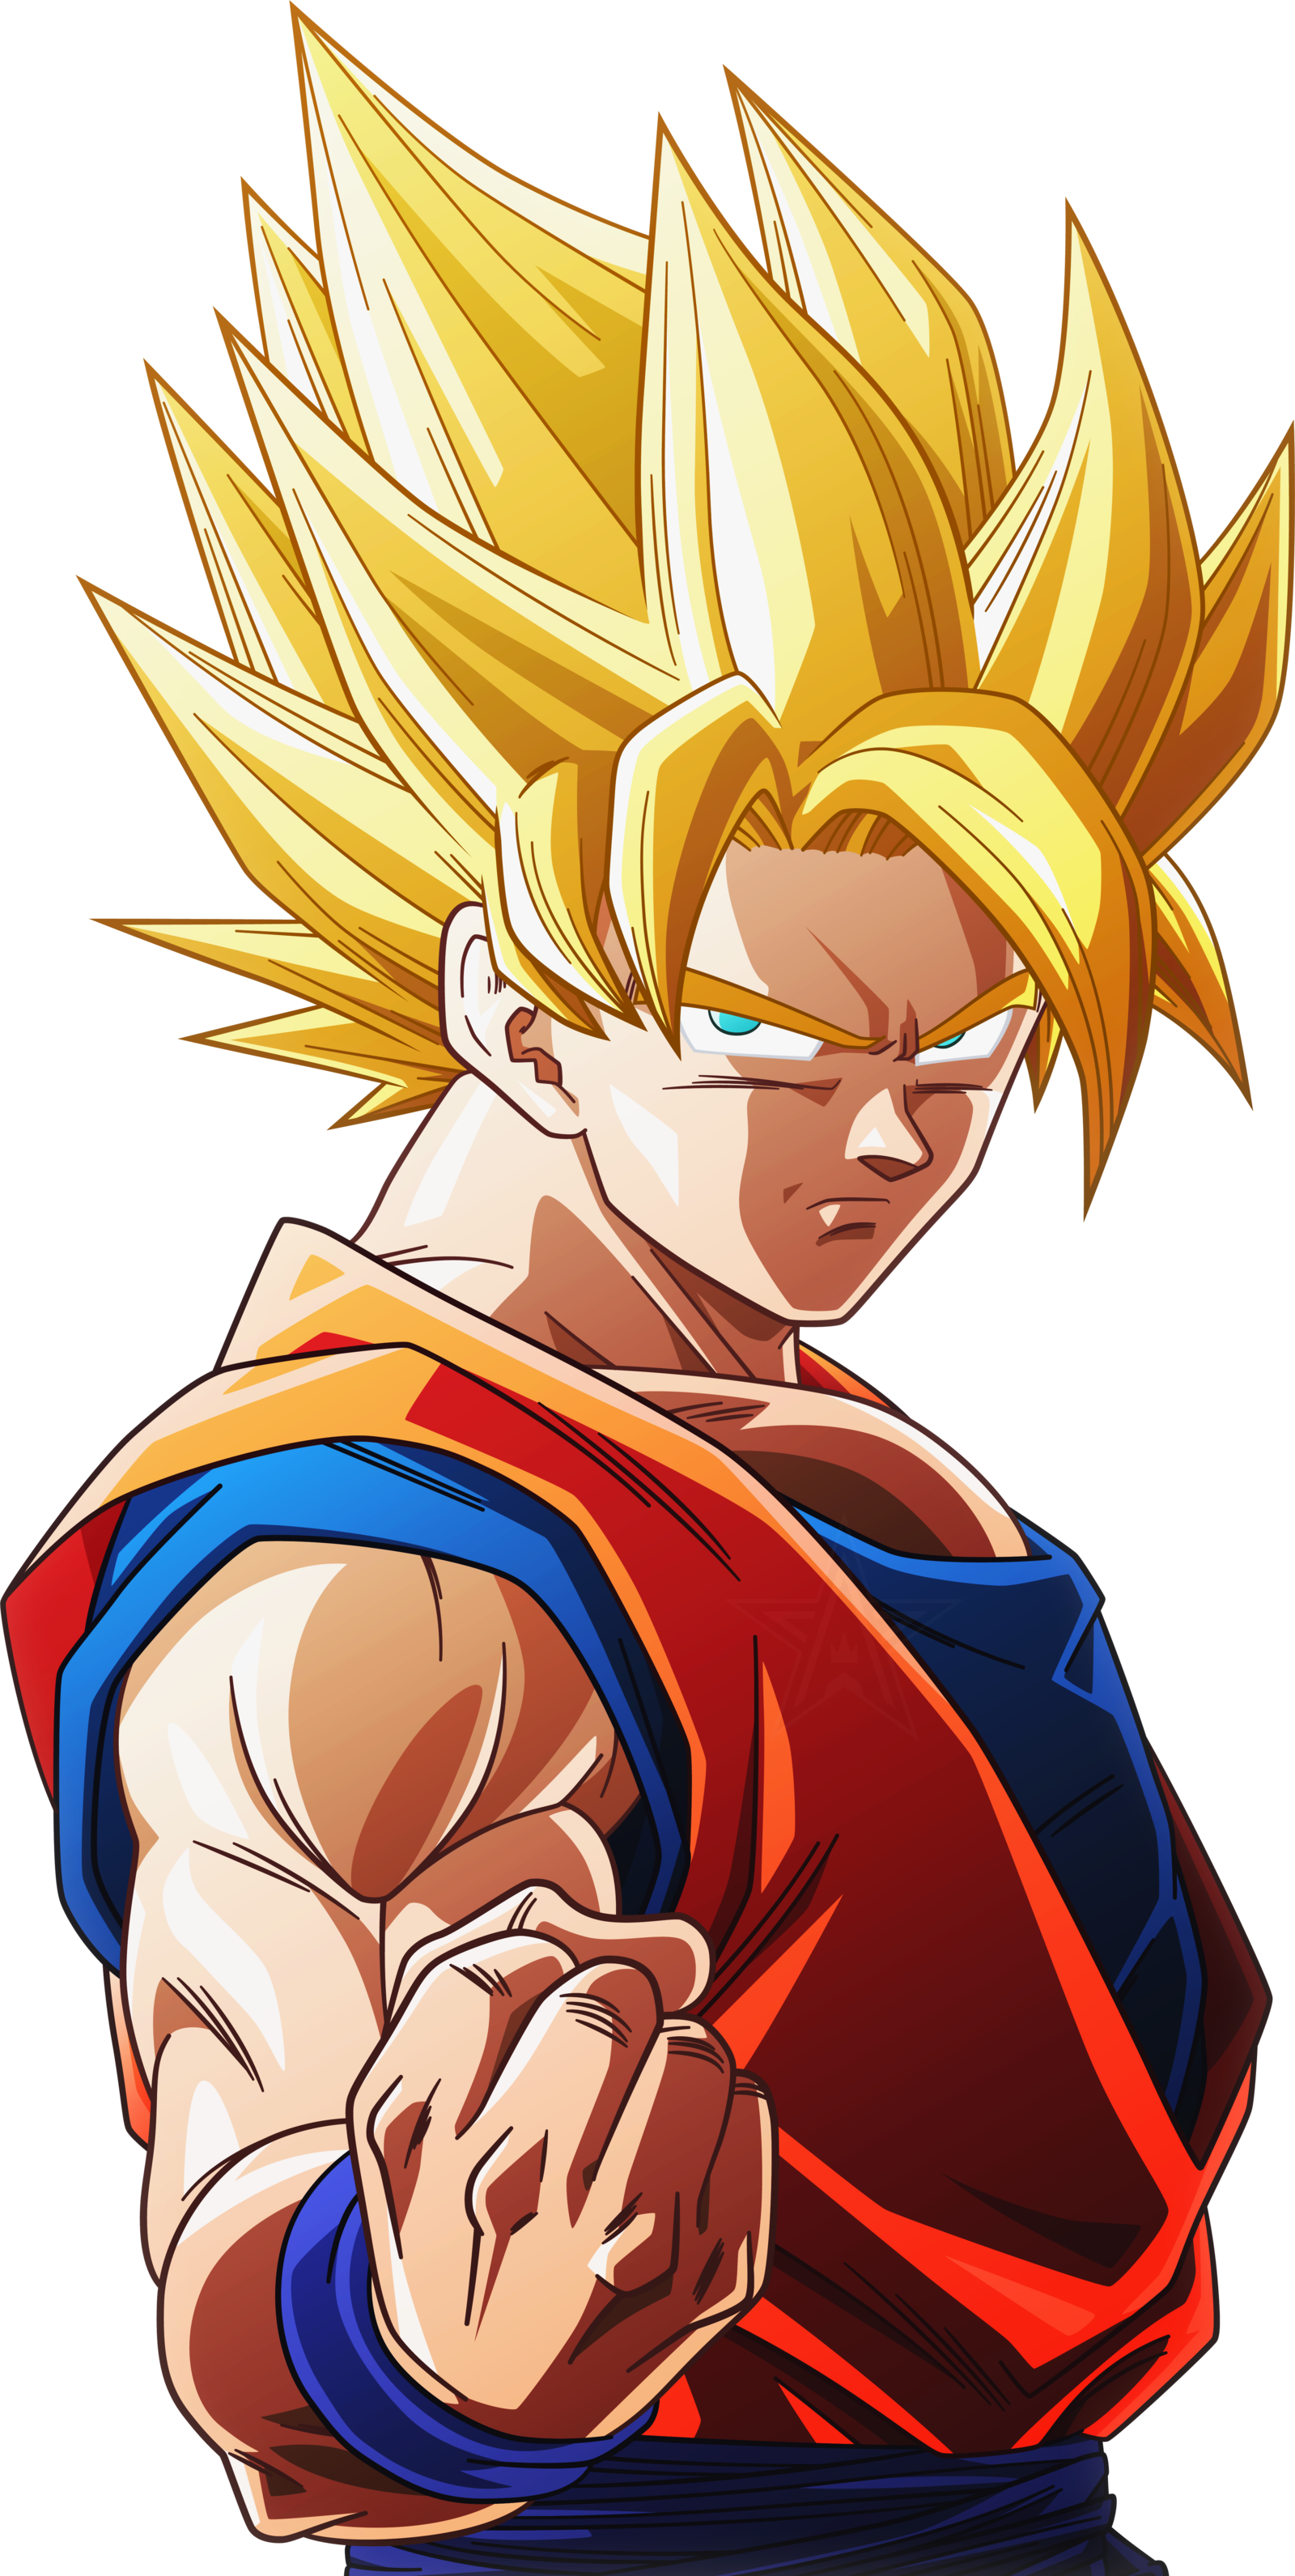 Pin By Quentin Moore On Goku De Dragon Ball Anime Dragon Ball Super Dragon Ball Super Goku Dragon Ball Super Manga